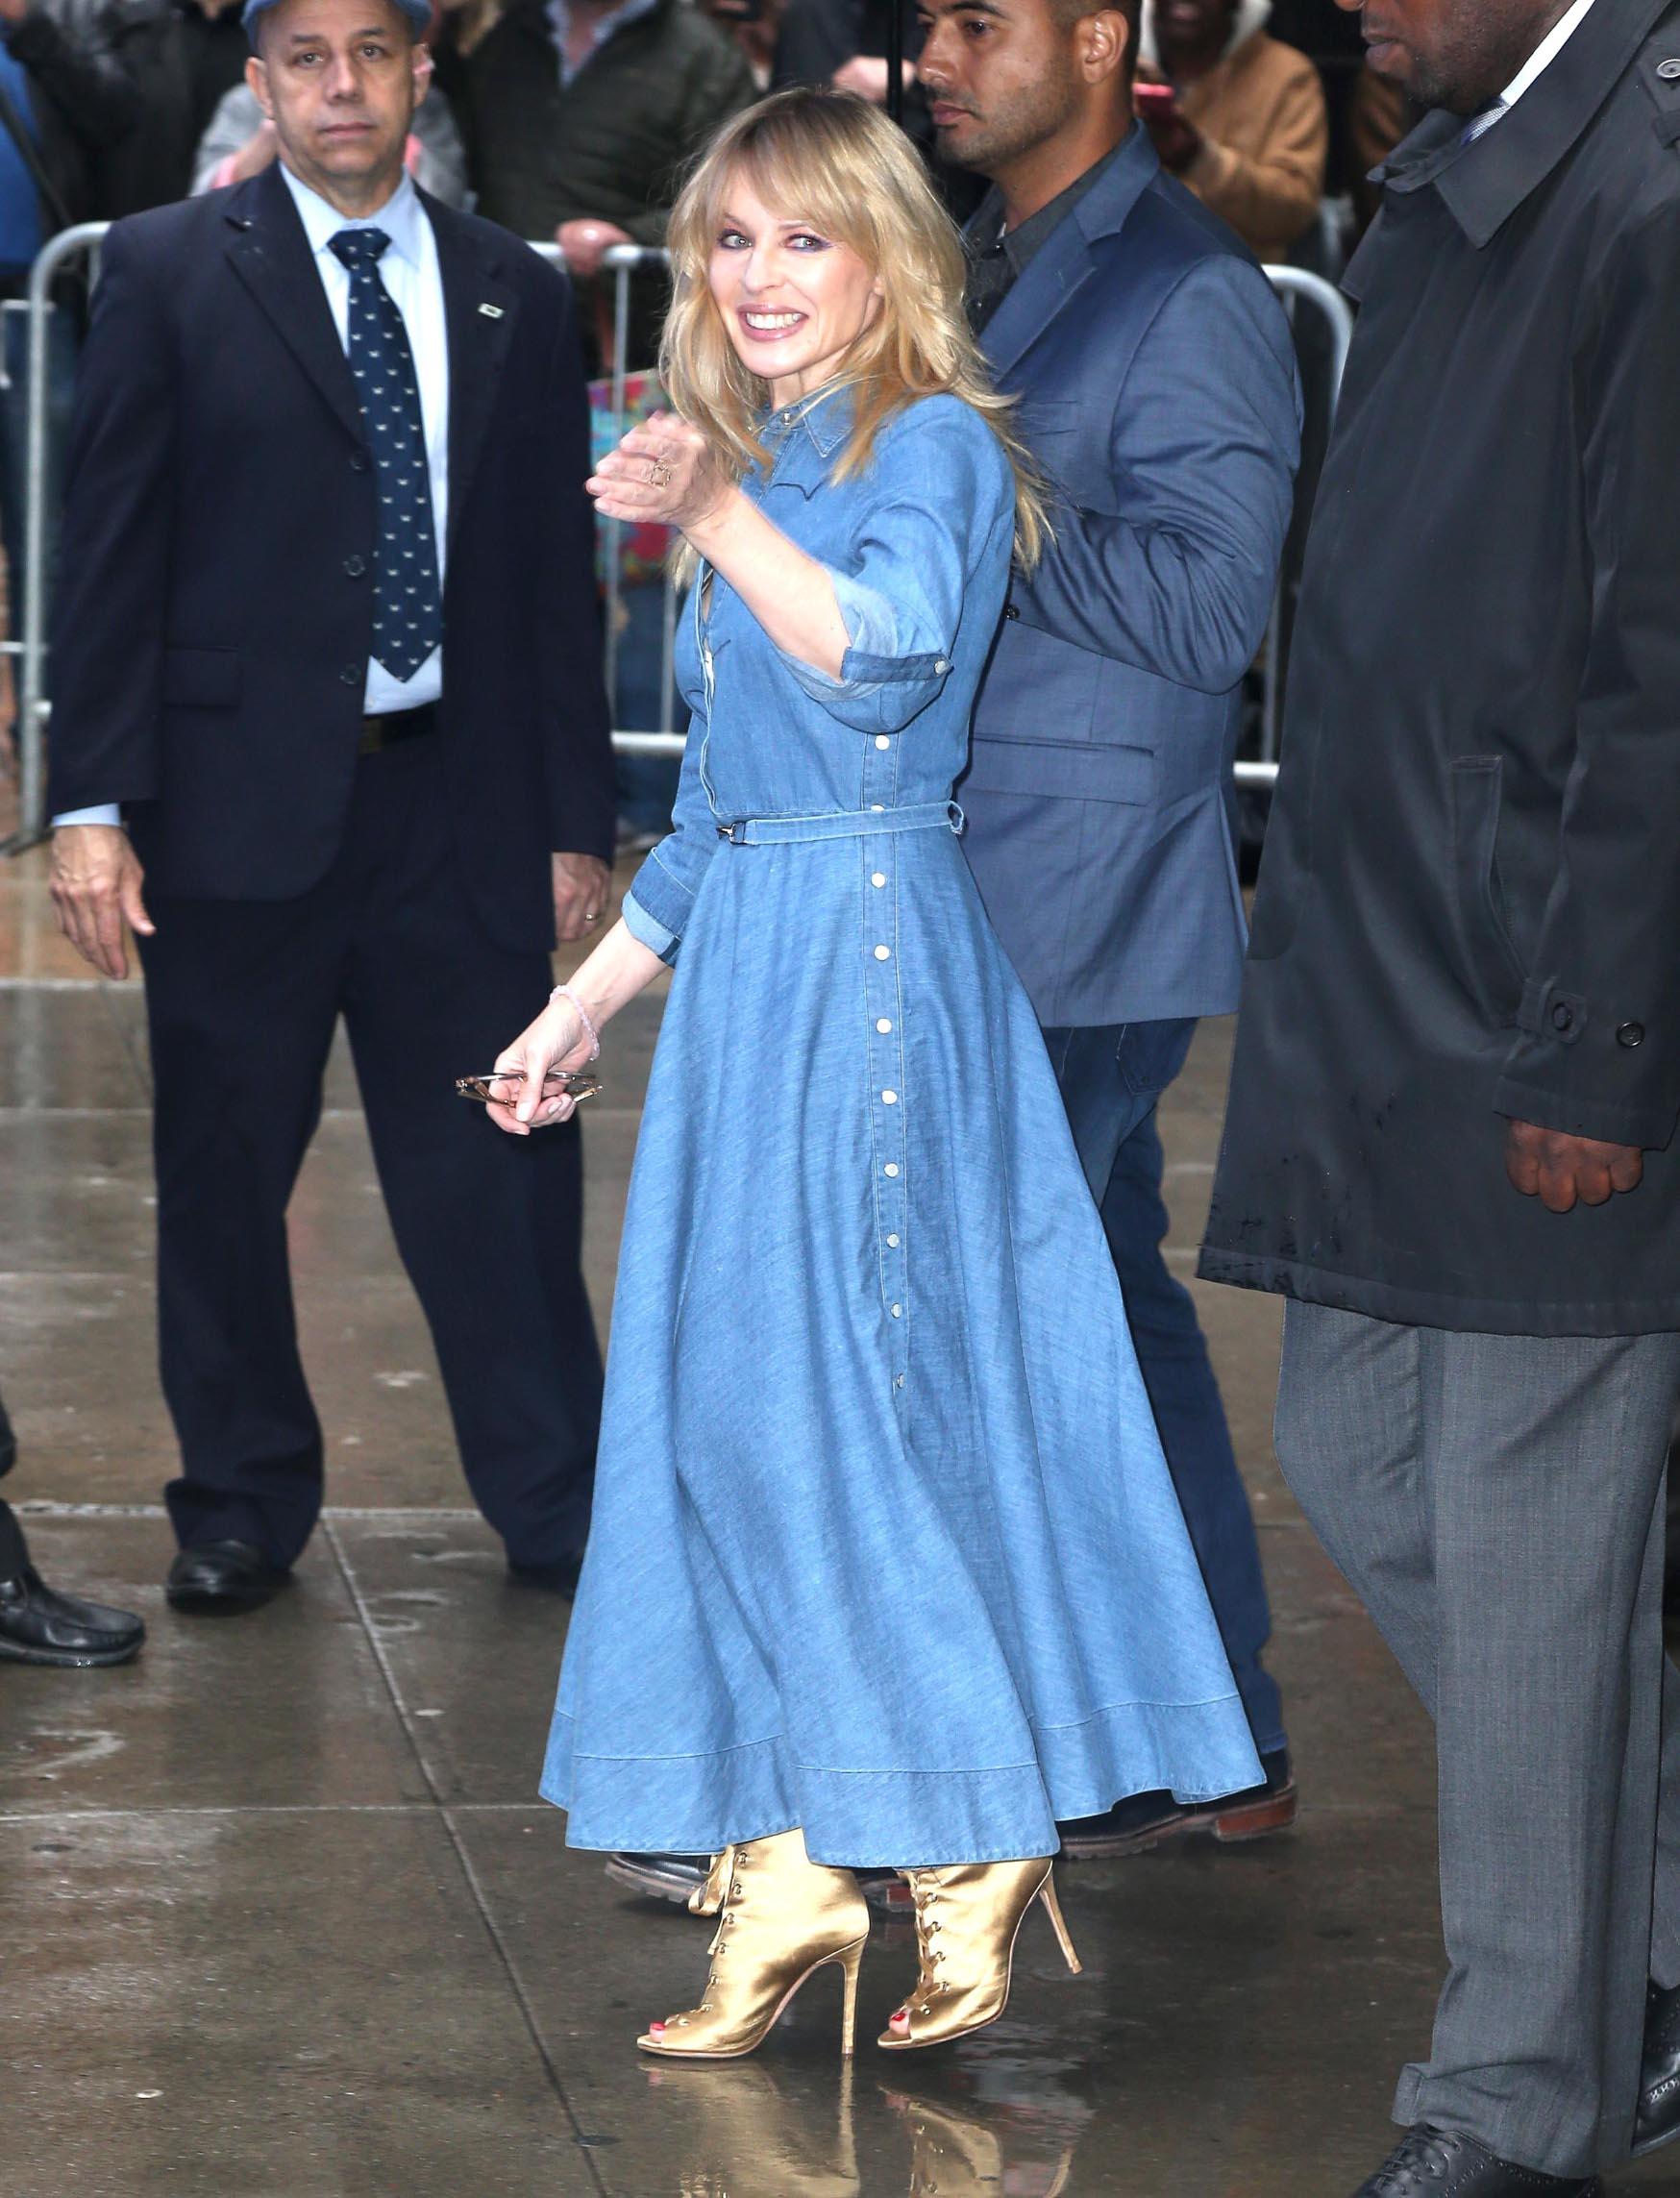 , New York, NY - 20180427-Kylie Minogue Arrives at Good Morning America in Denim Dress  -PICTURED: Kylie Minogue -, Image: 369905489, License: Rights-managed, Restrictions: , Model Release: no, Credit line: DARA KUSHNER / INSTAR Images / Profimedia